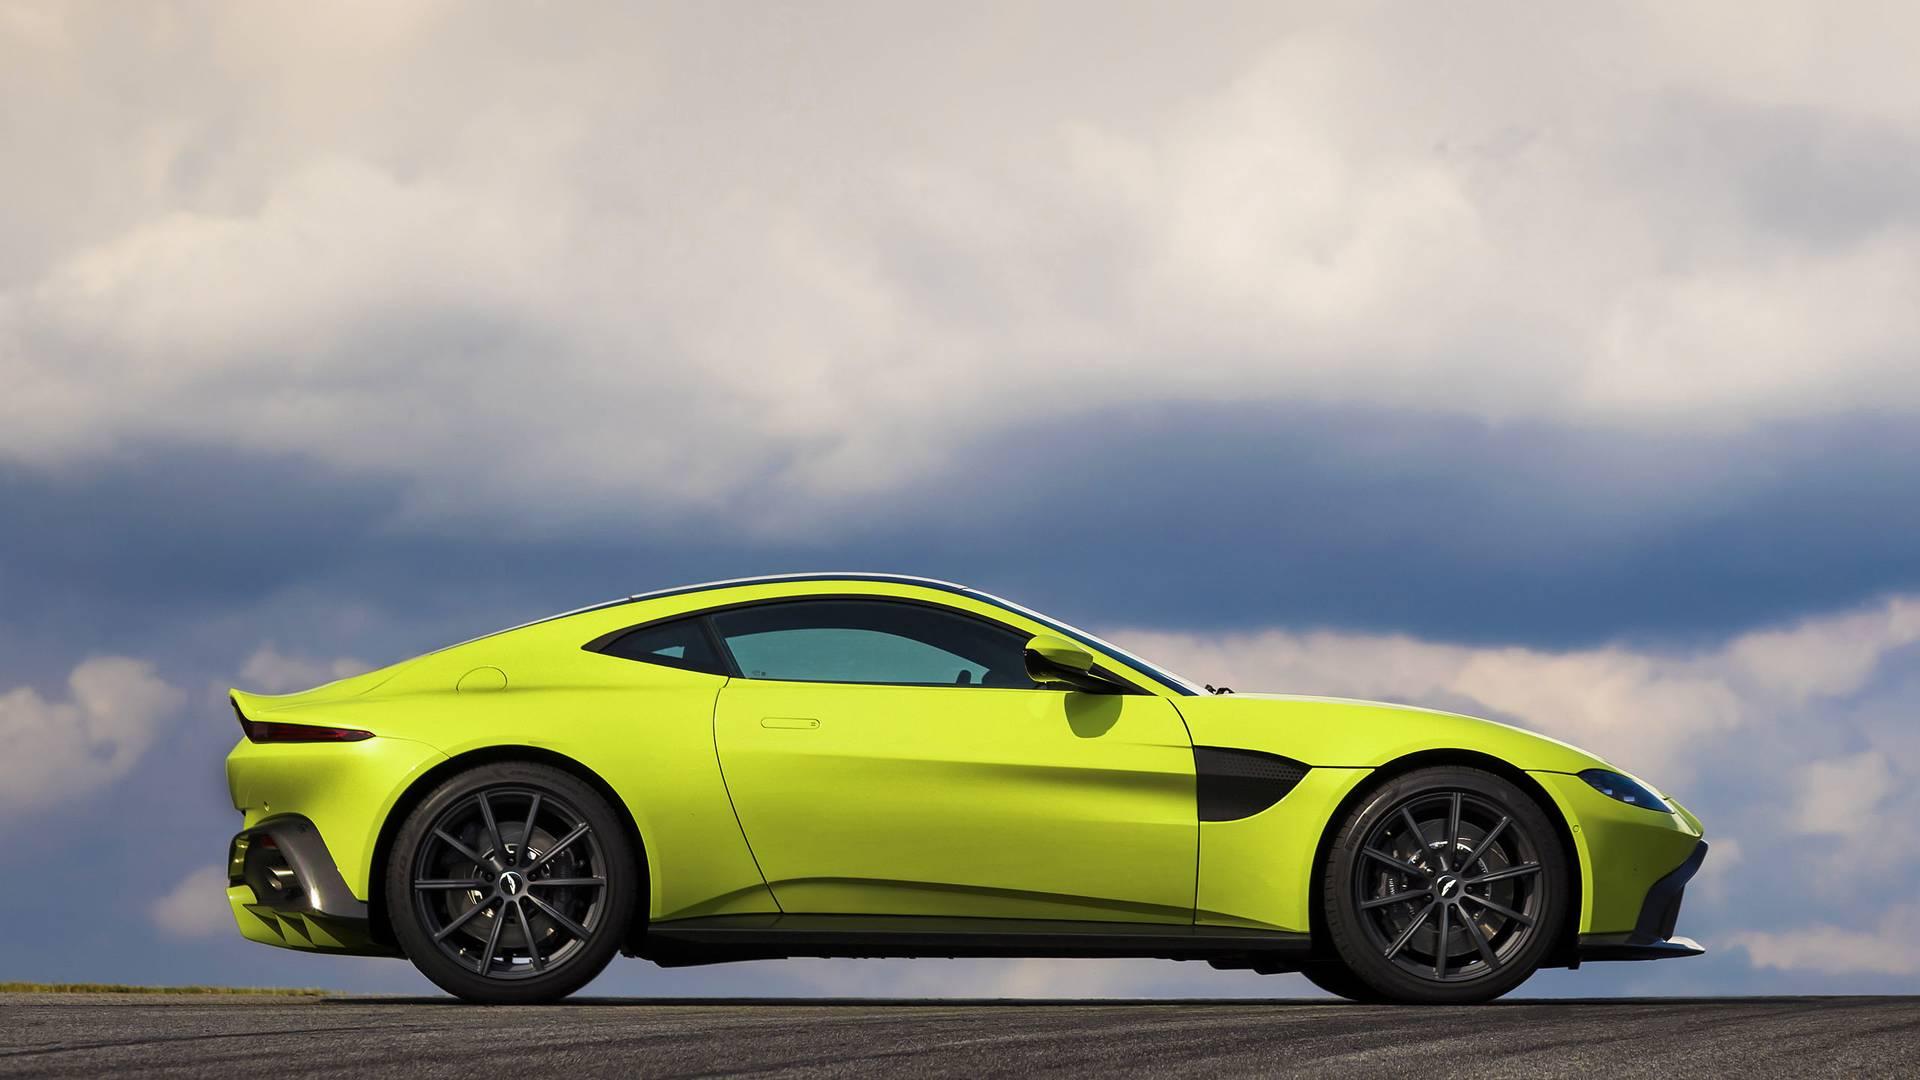 2018 Aston Martin Vantage Motor1com Photos 1920x1080